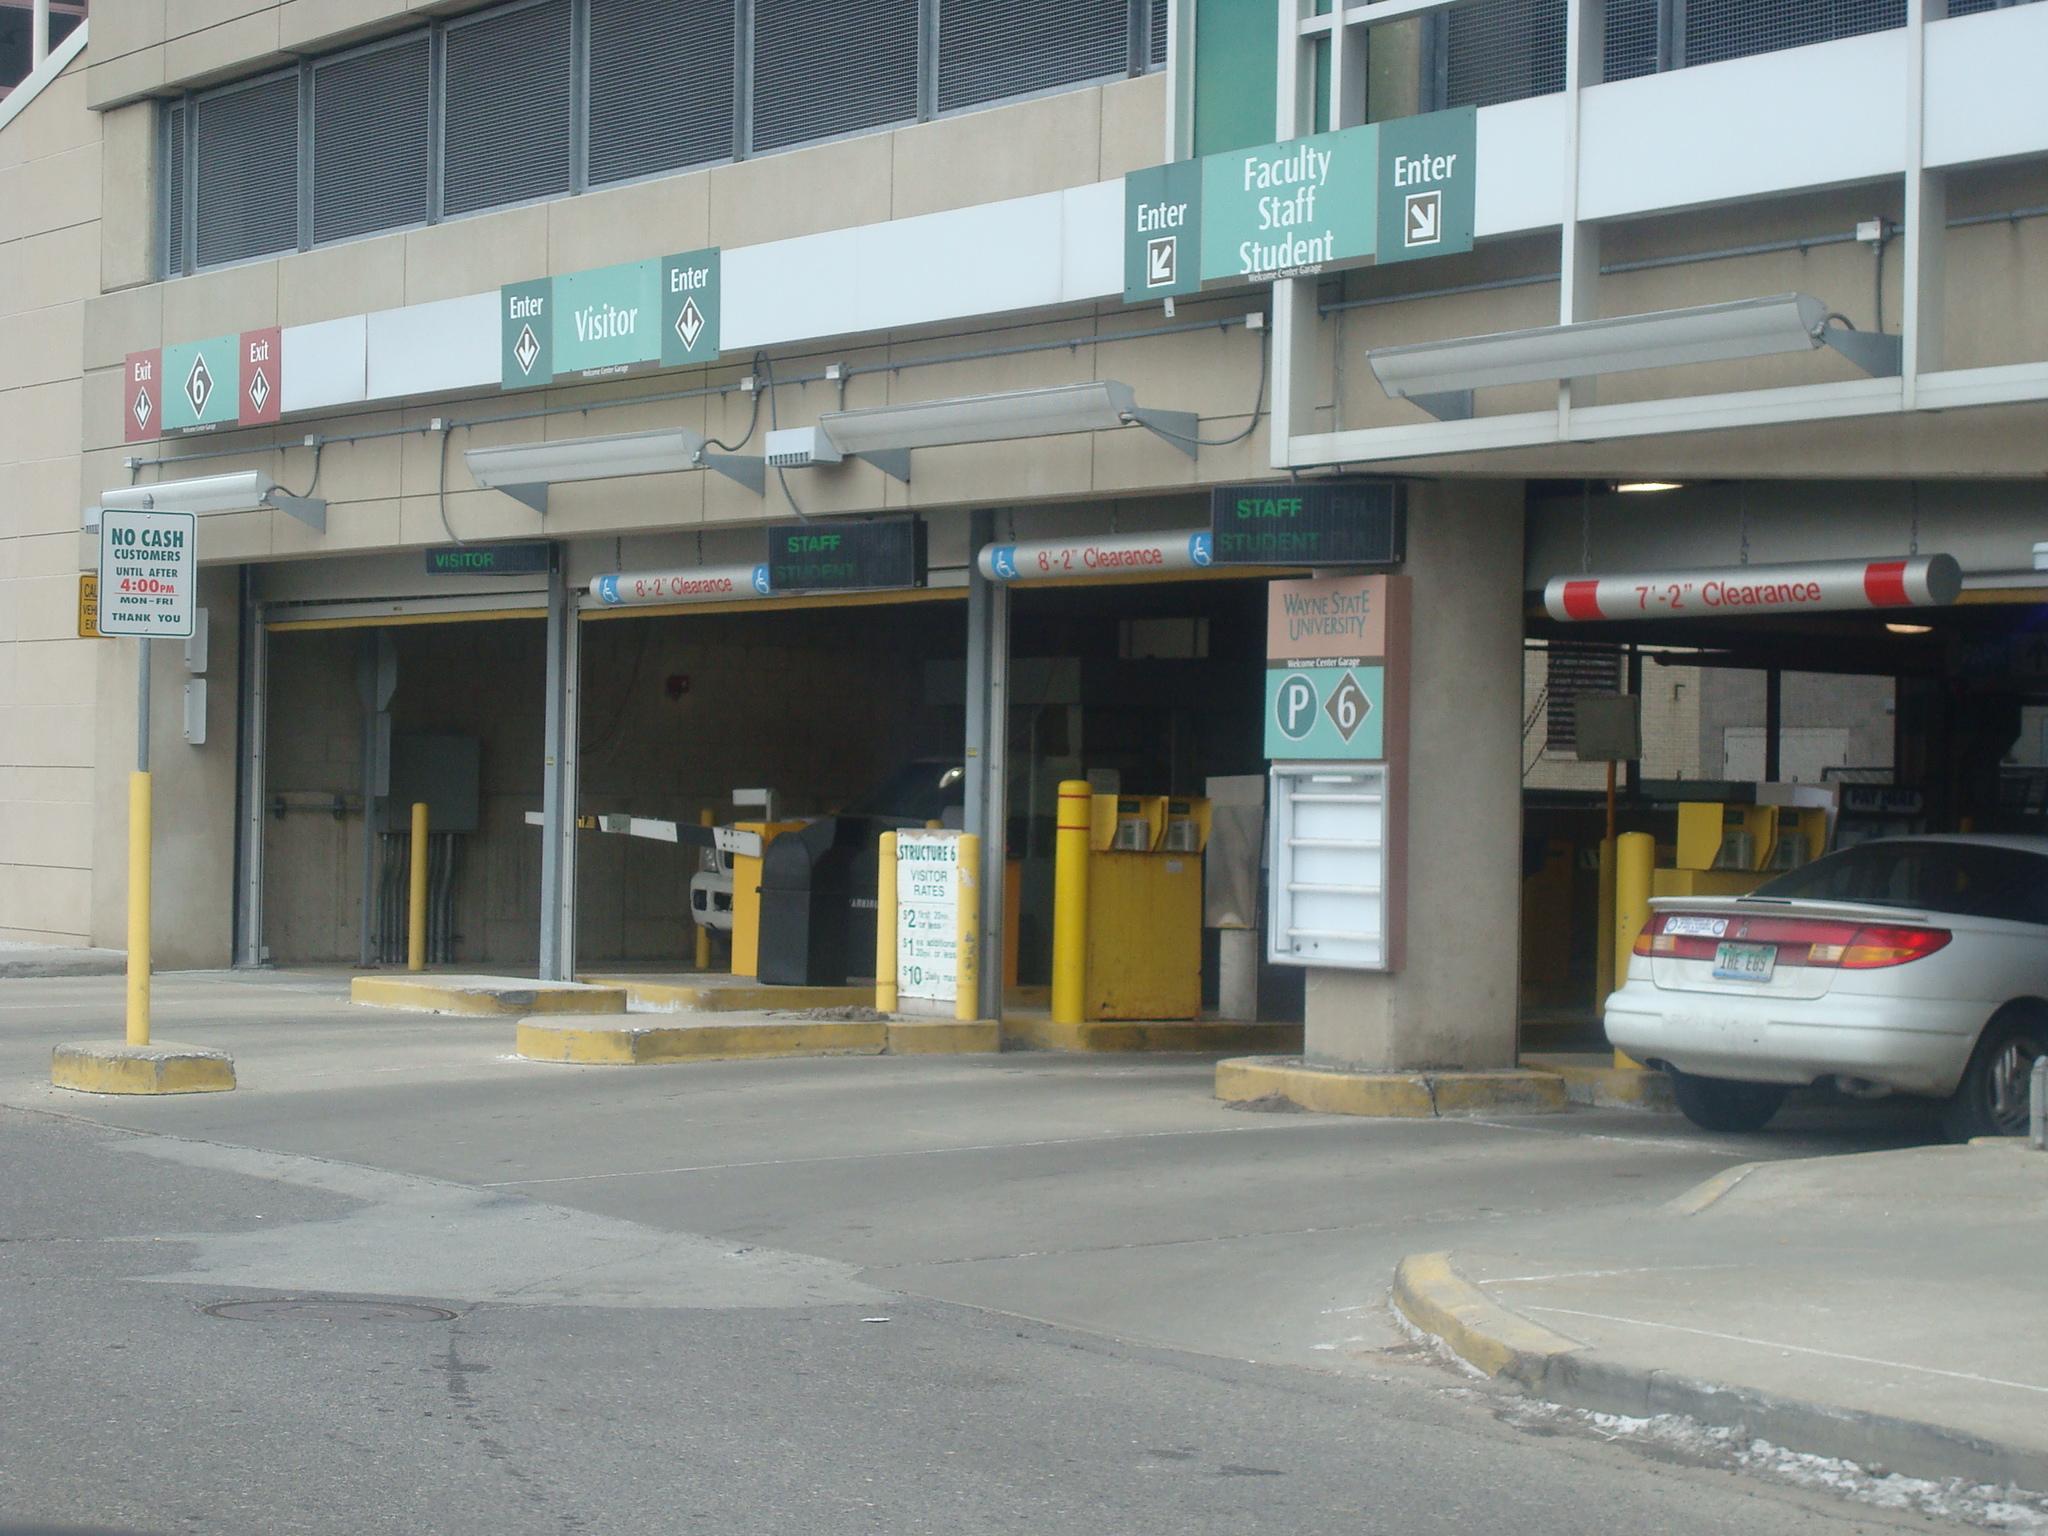 To Garage: SUN\p\parking_garage\entrance